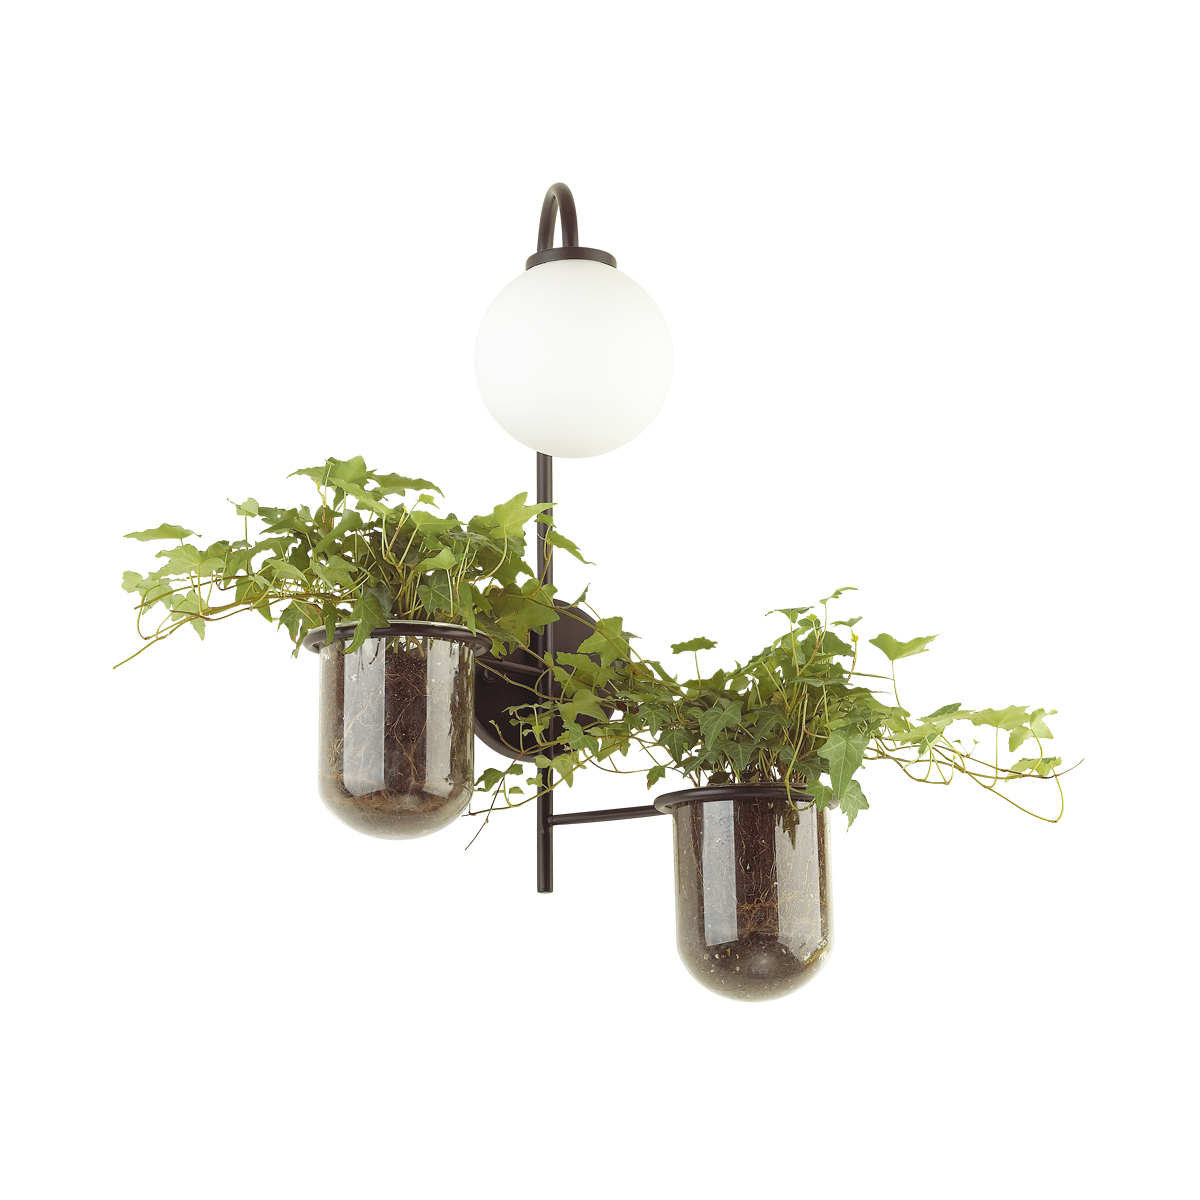 Бра Odeon Light Flower 4681/1W, 1xE14x40W, черный, белый, металл со стеклом, стекло - фото 2